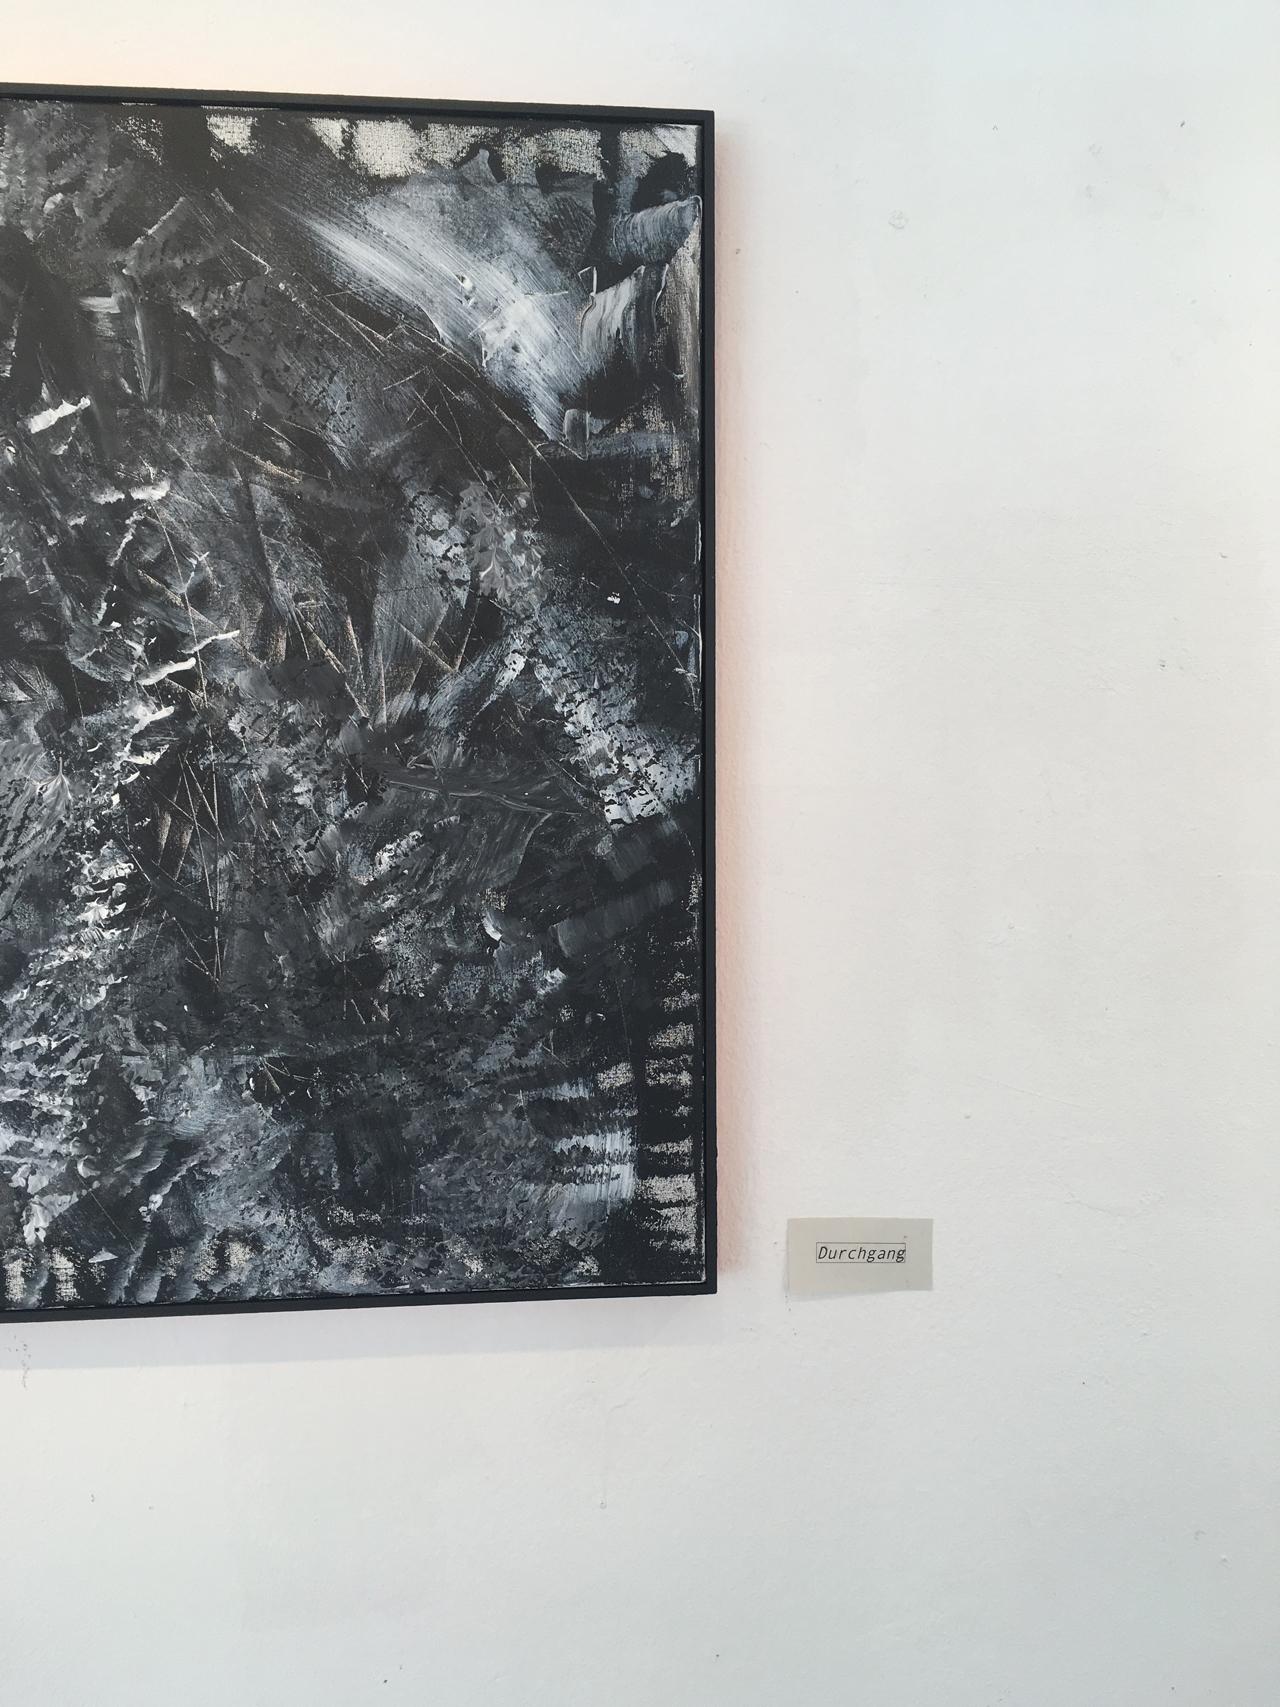 Feierwerk_Blog_Farbenladen_Ausstellung_Fliessen_lassen_Durchgang_4